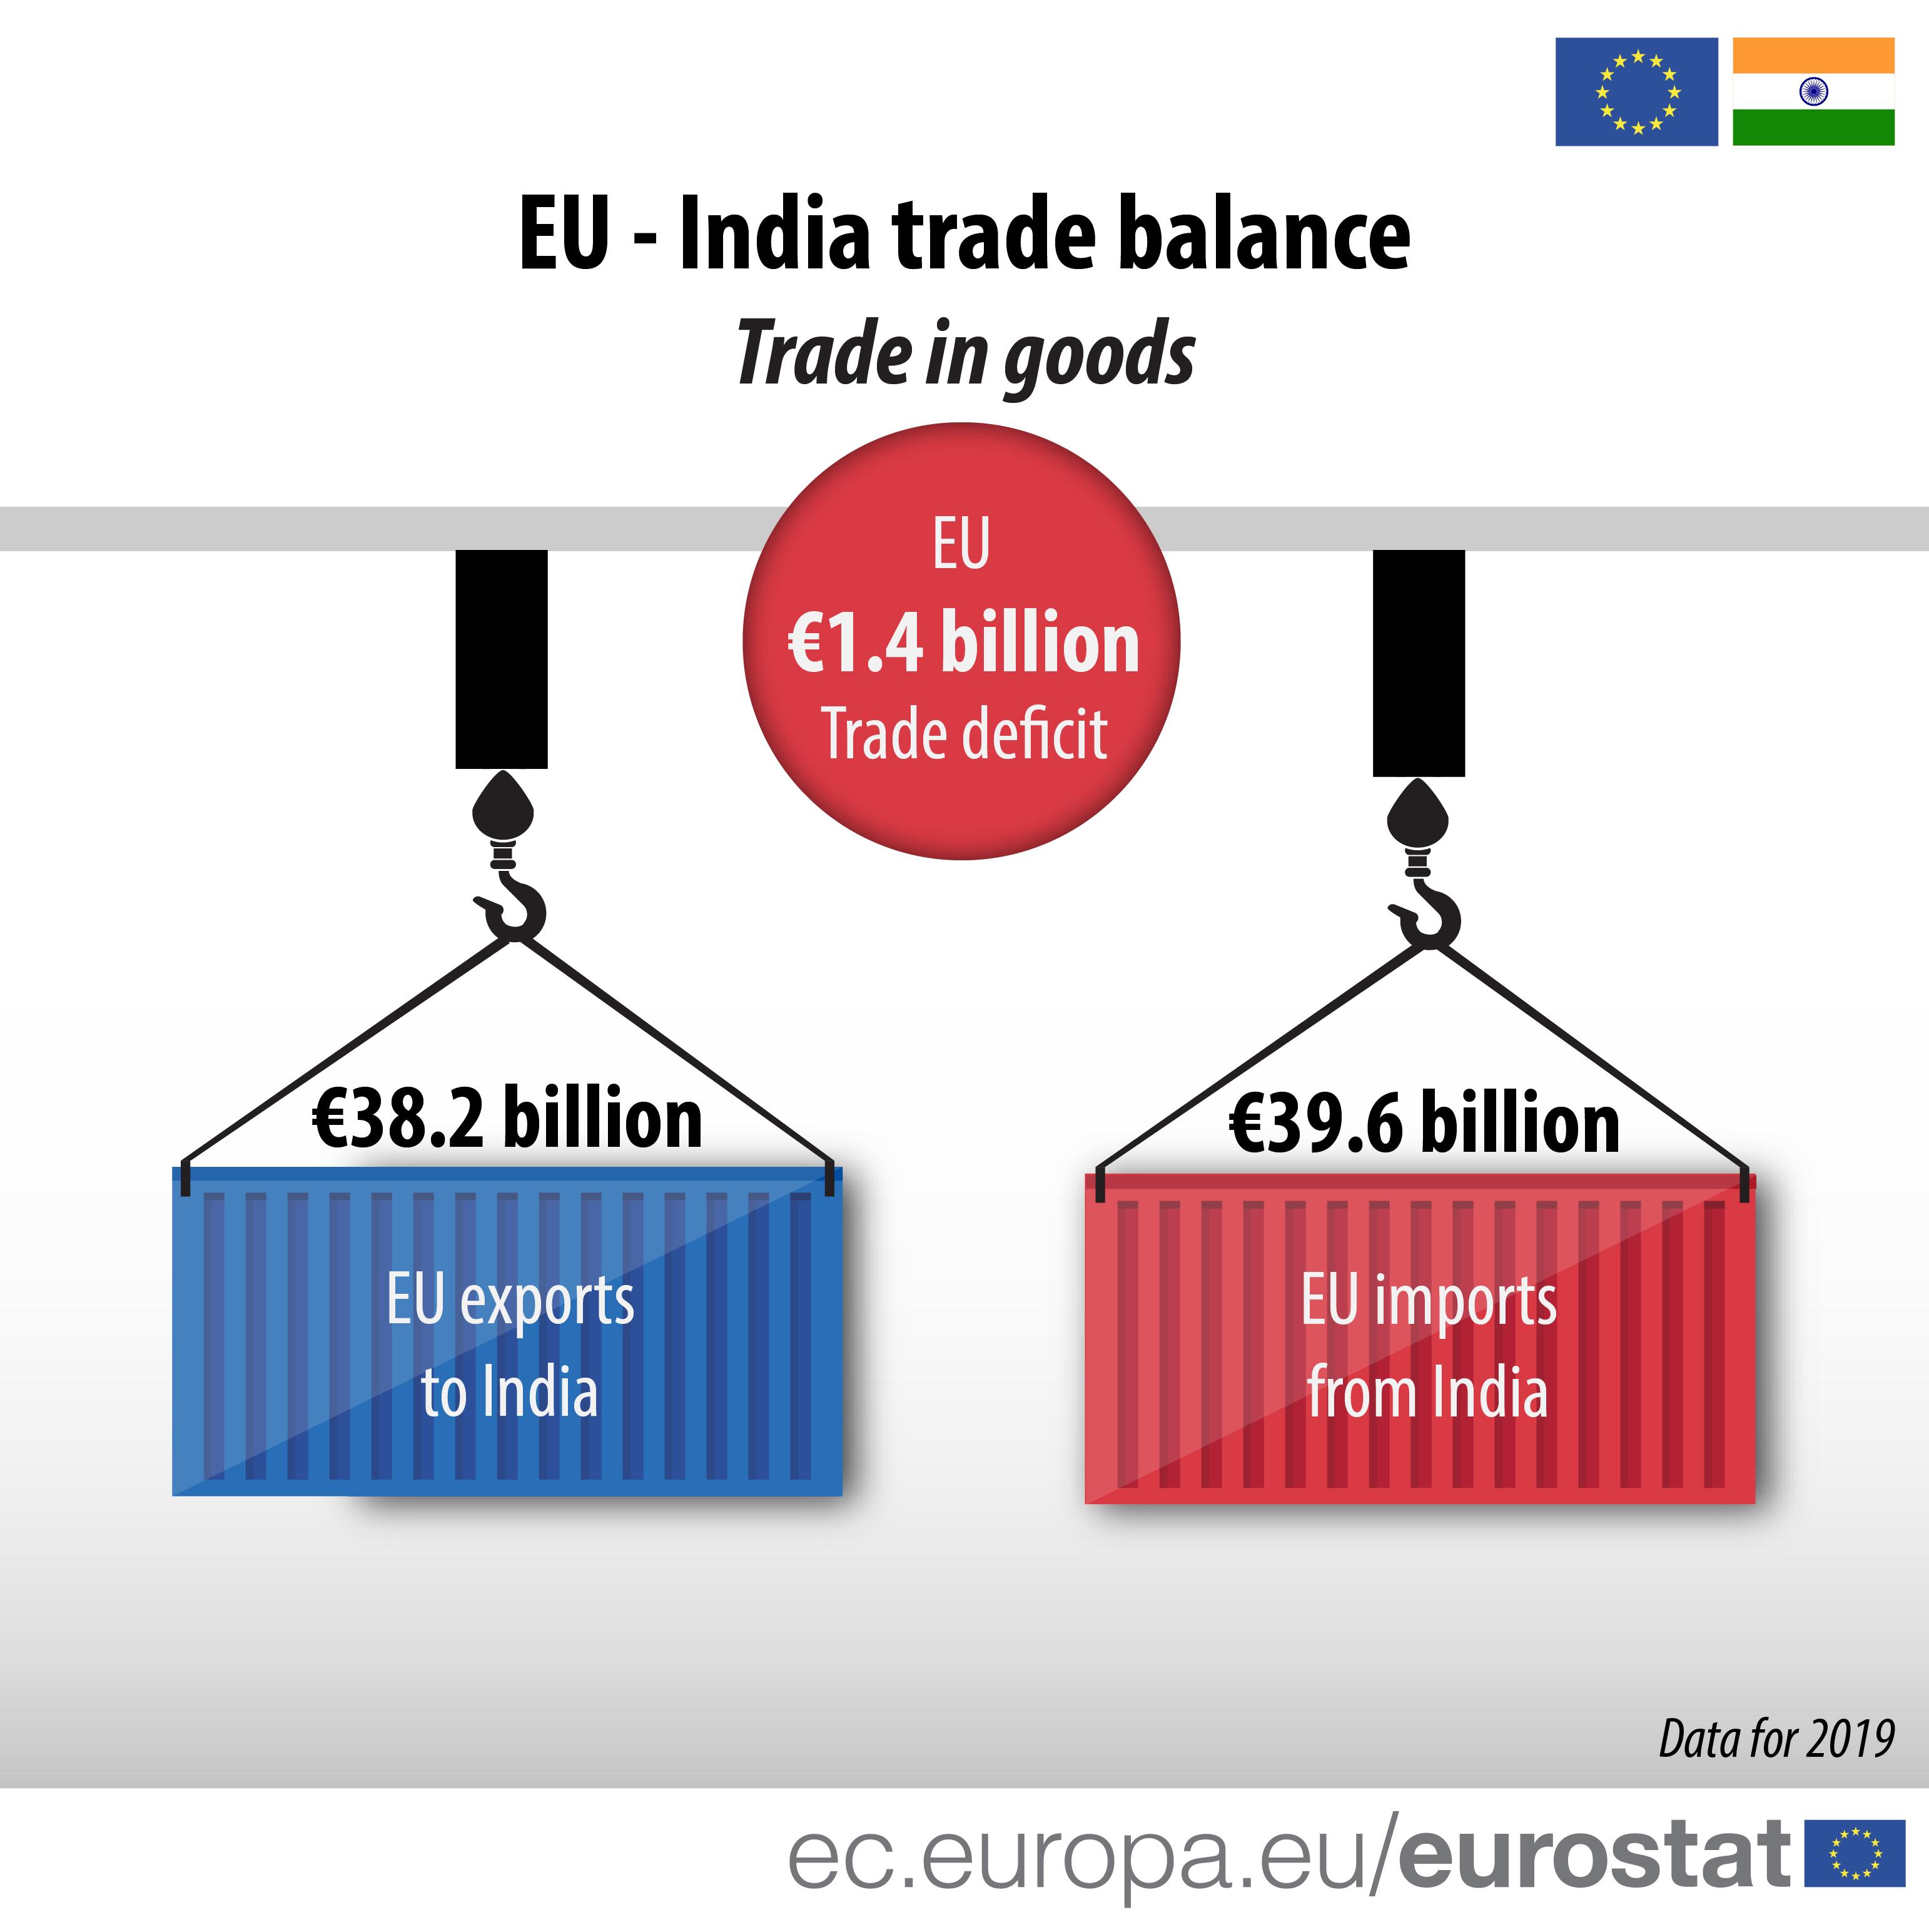 EU - India trade balance